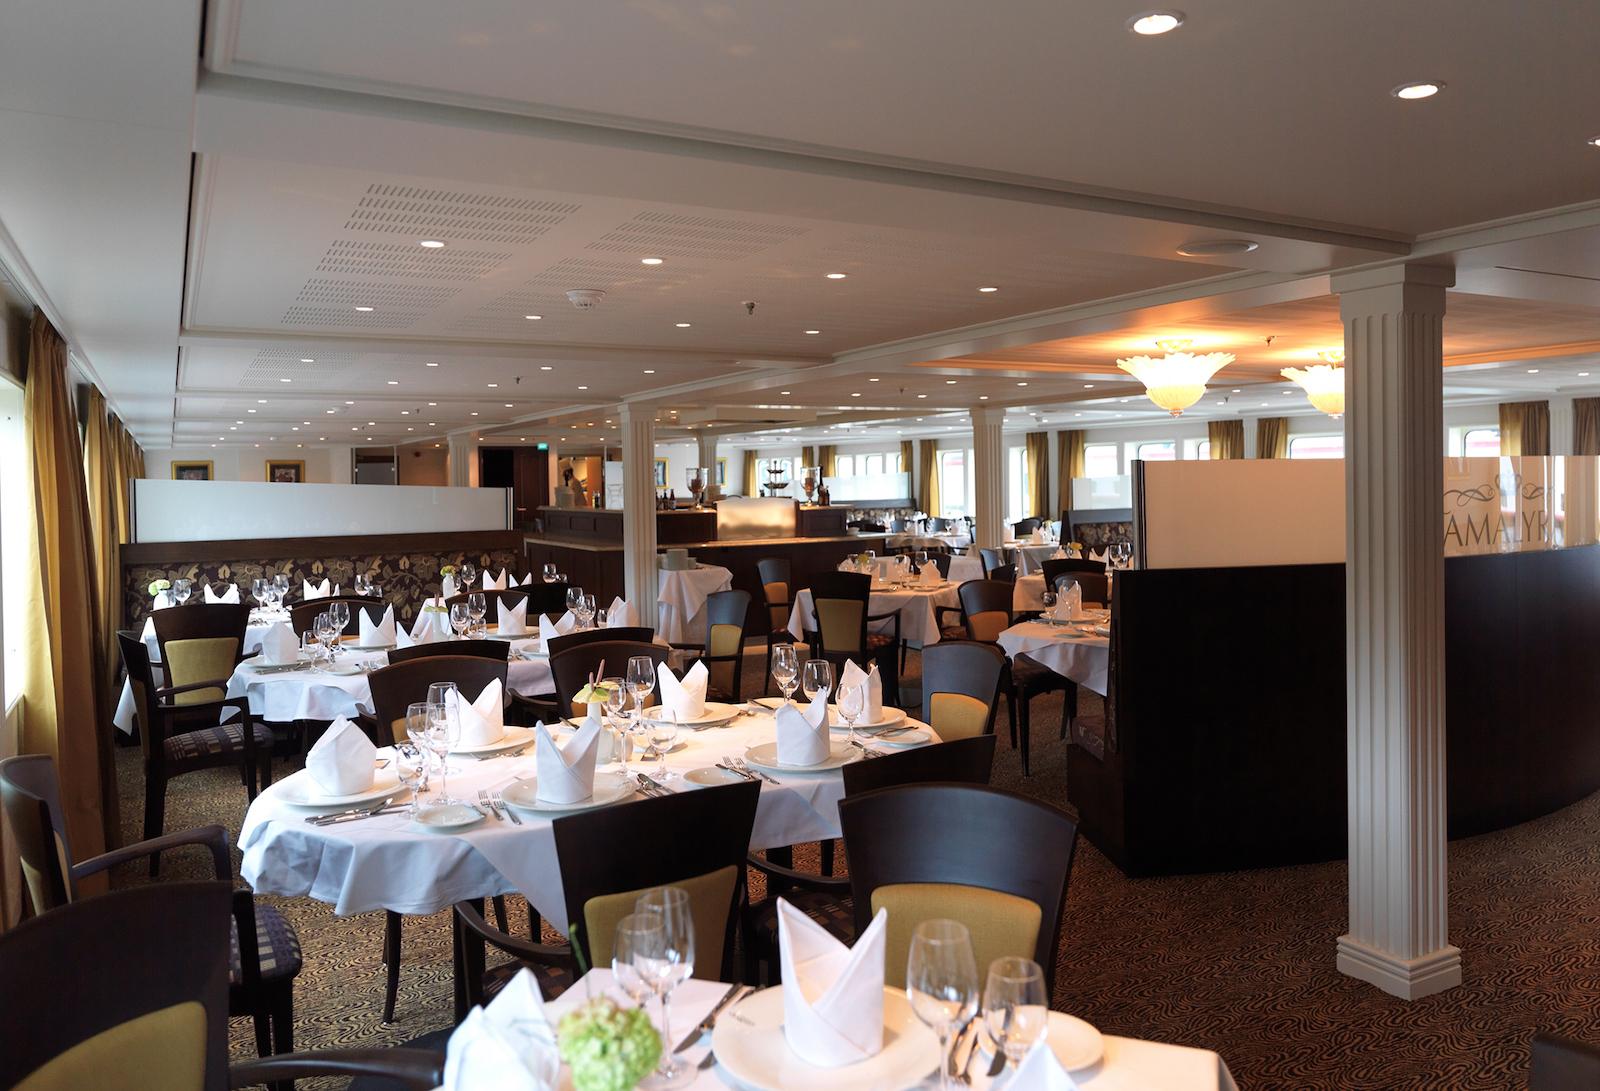 AmaLyra Restaurant